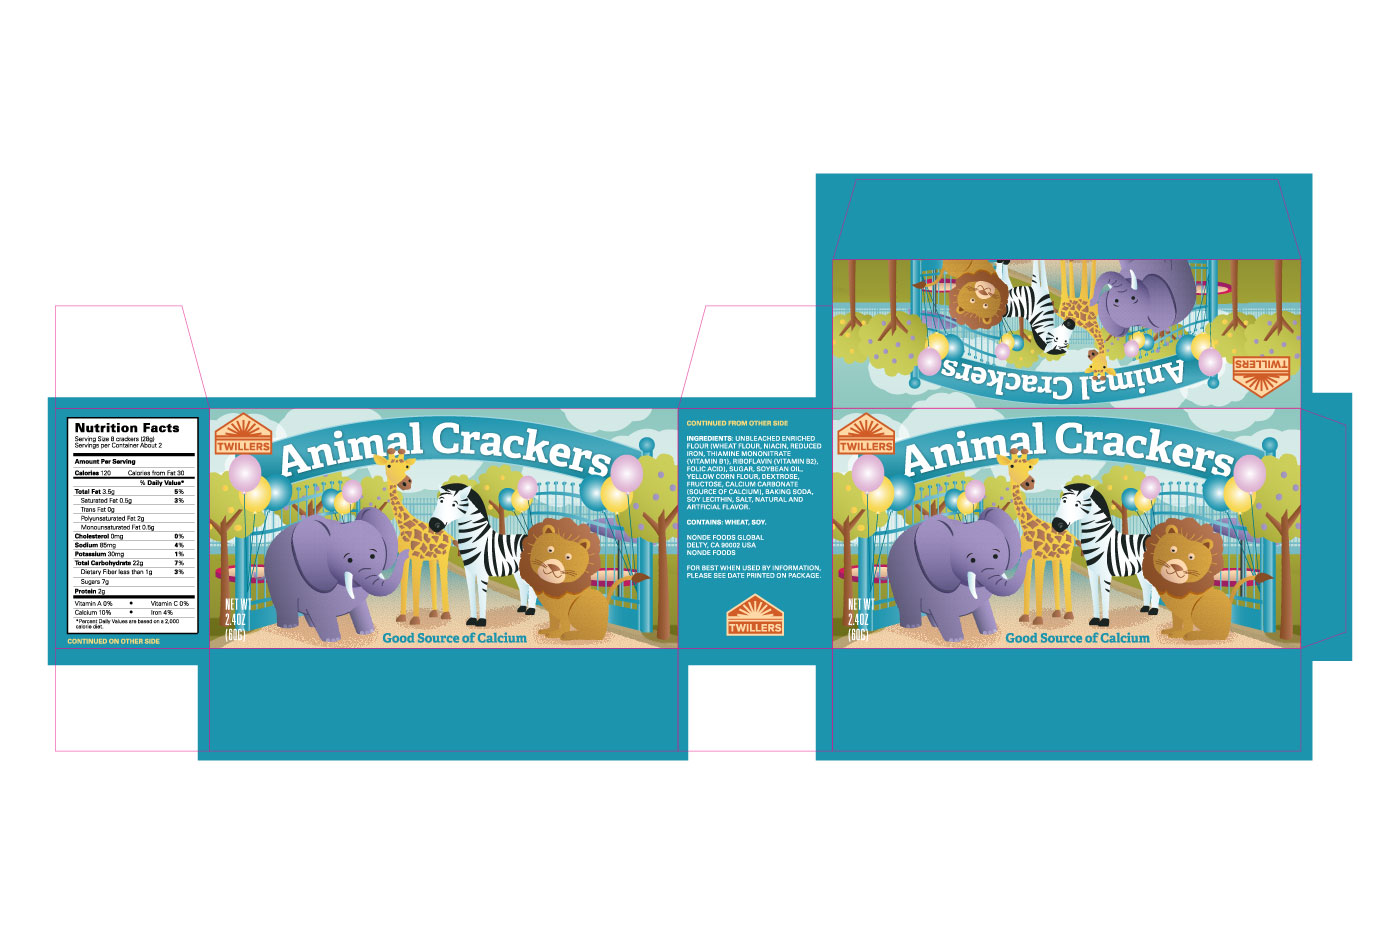 animal crackers box packaging